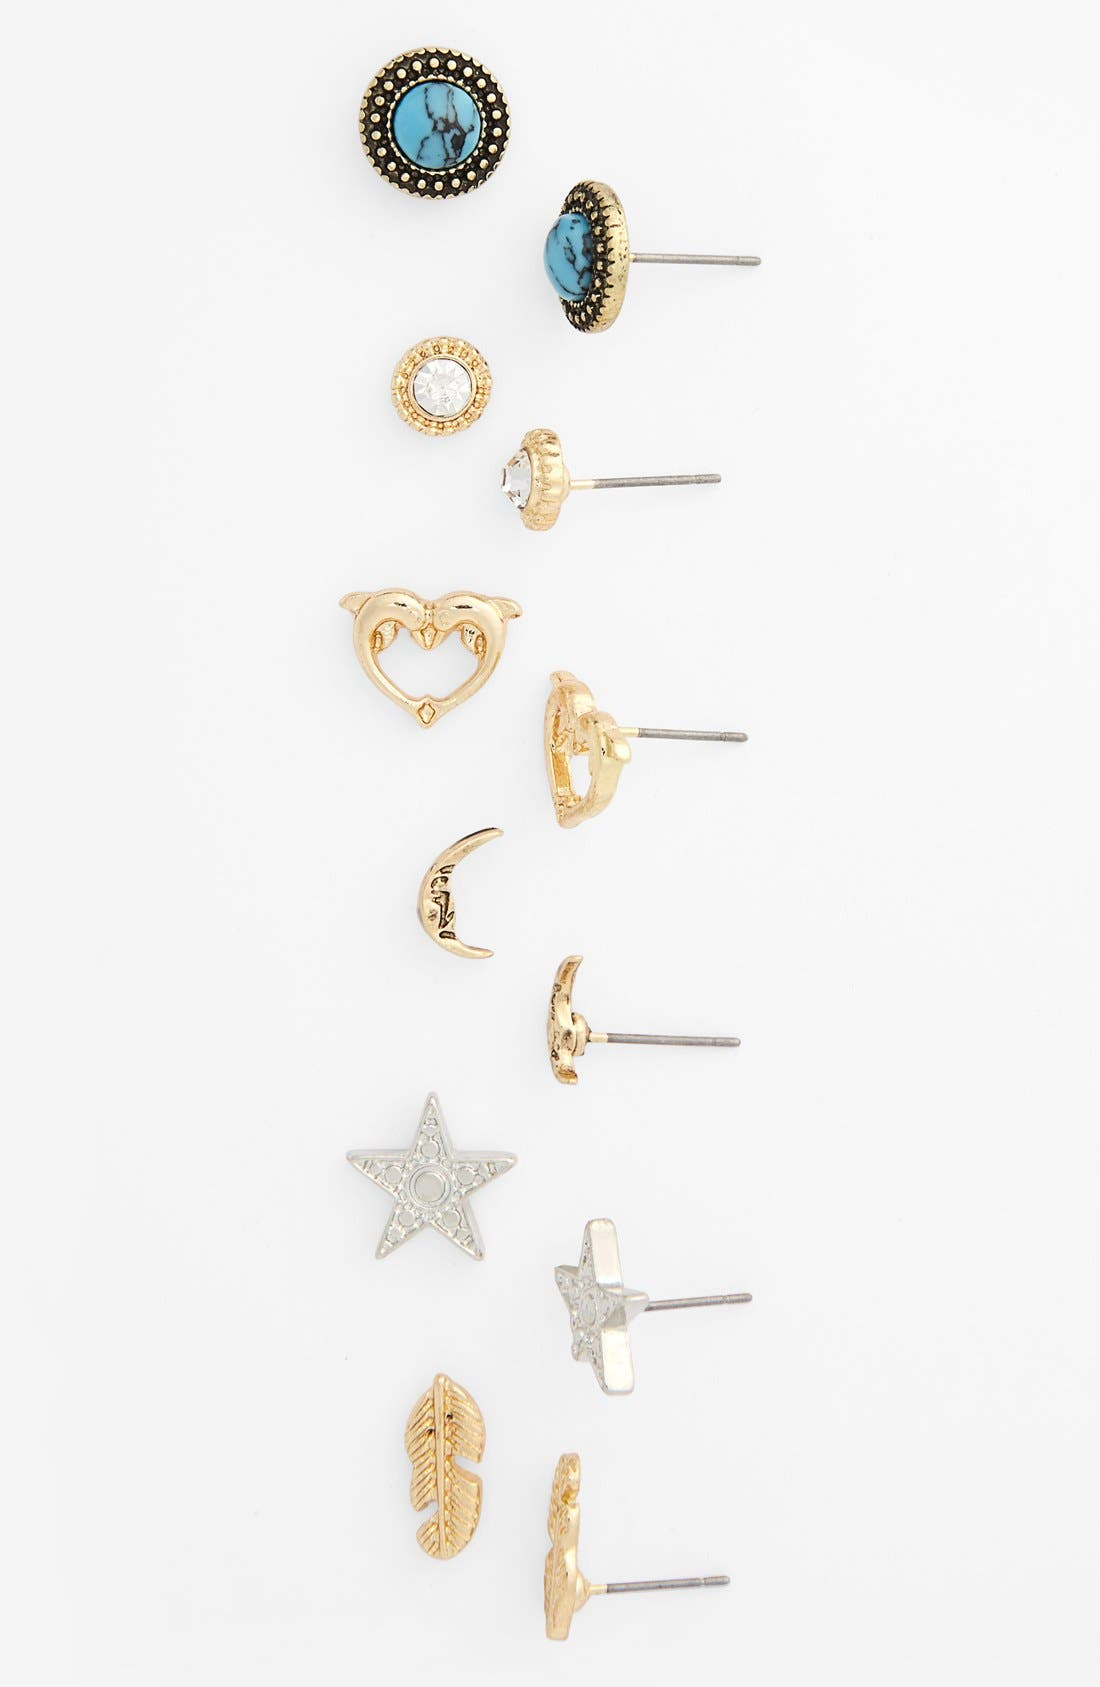 Alternate Image 1 Selected - Topshop Mixed Stud Earrings (Set of 6)